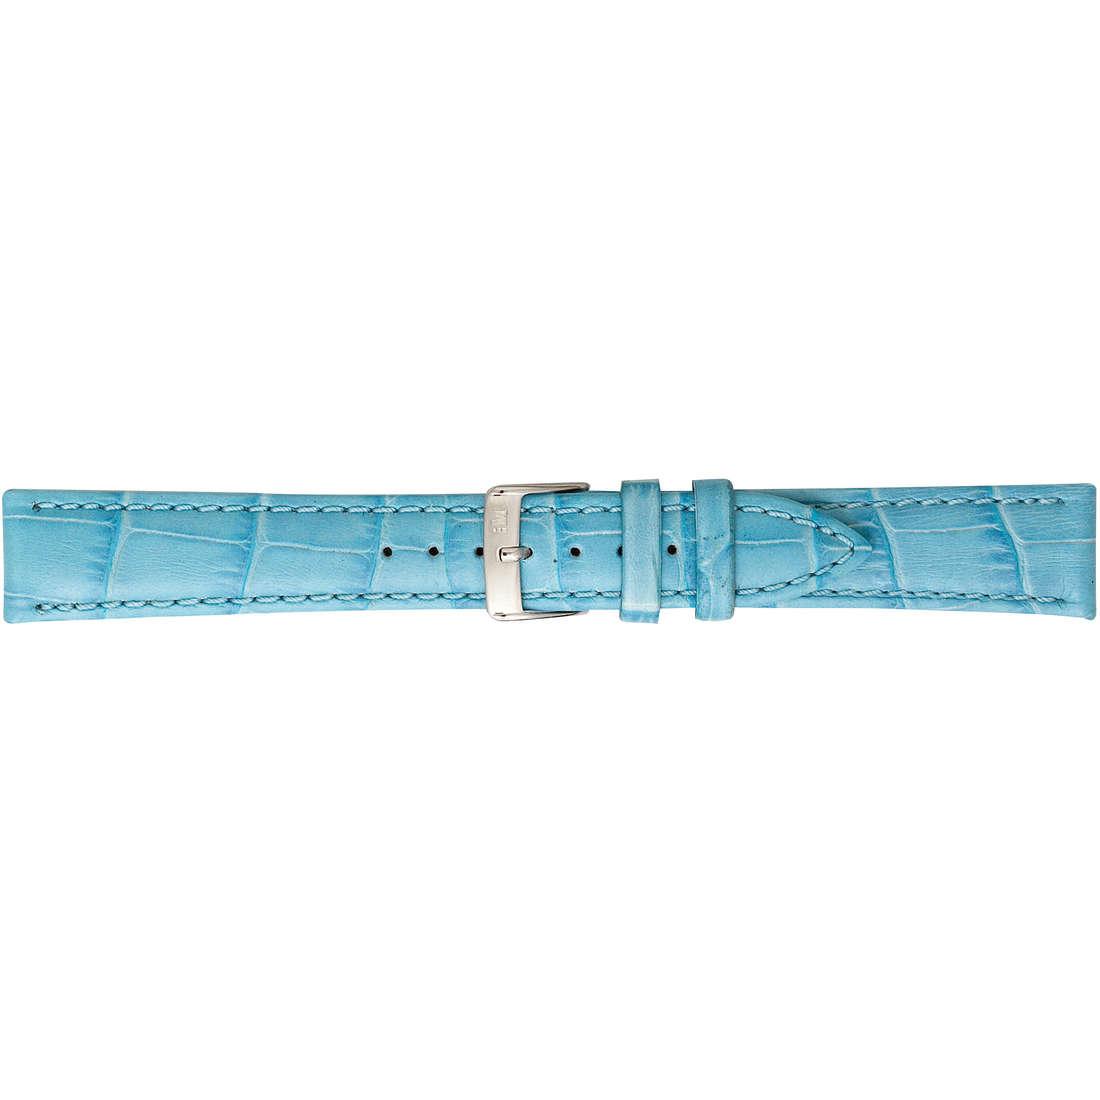 watch watch bands watch straps man Morellato Morellato 1930 A01X2269480168CR22